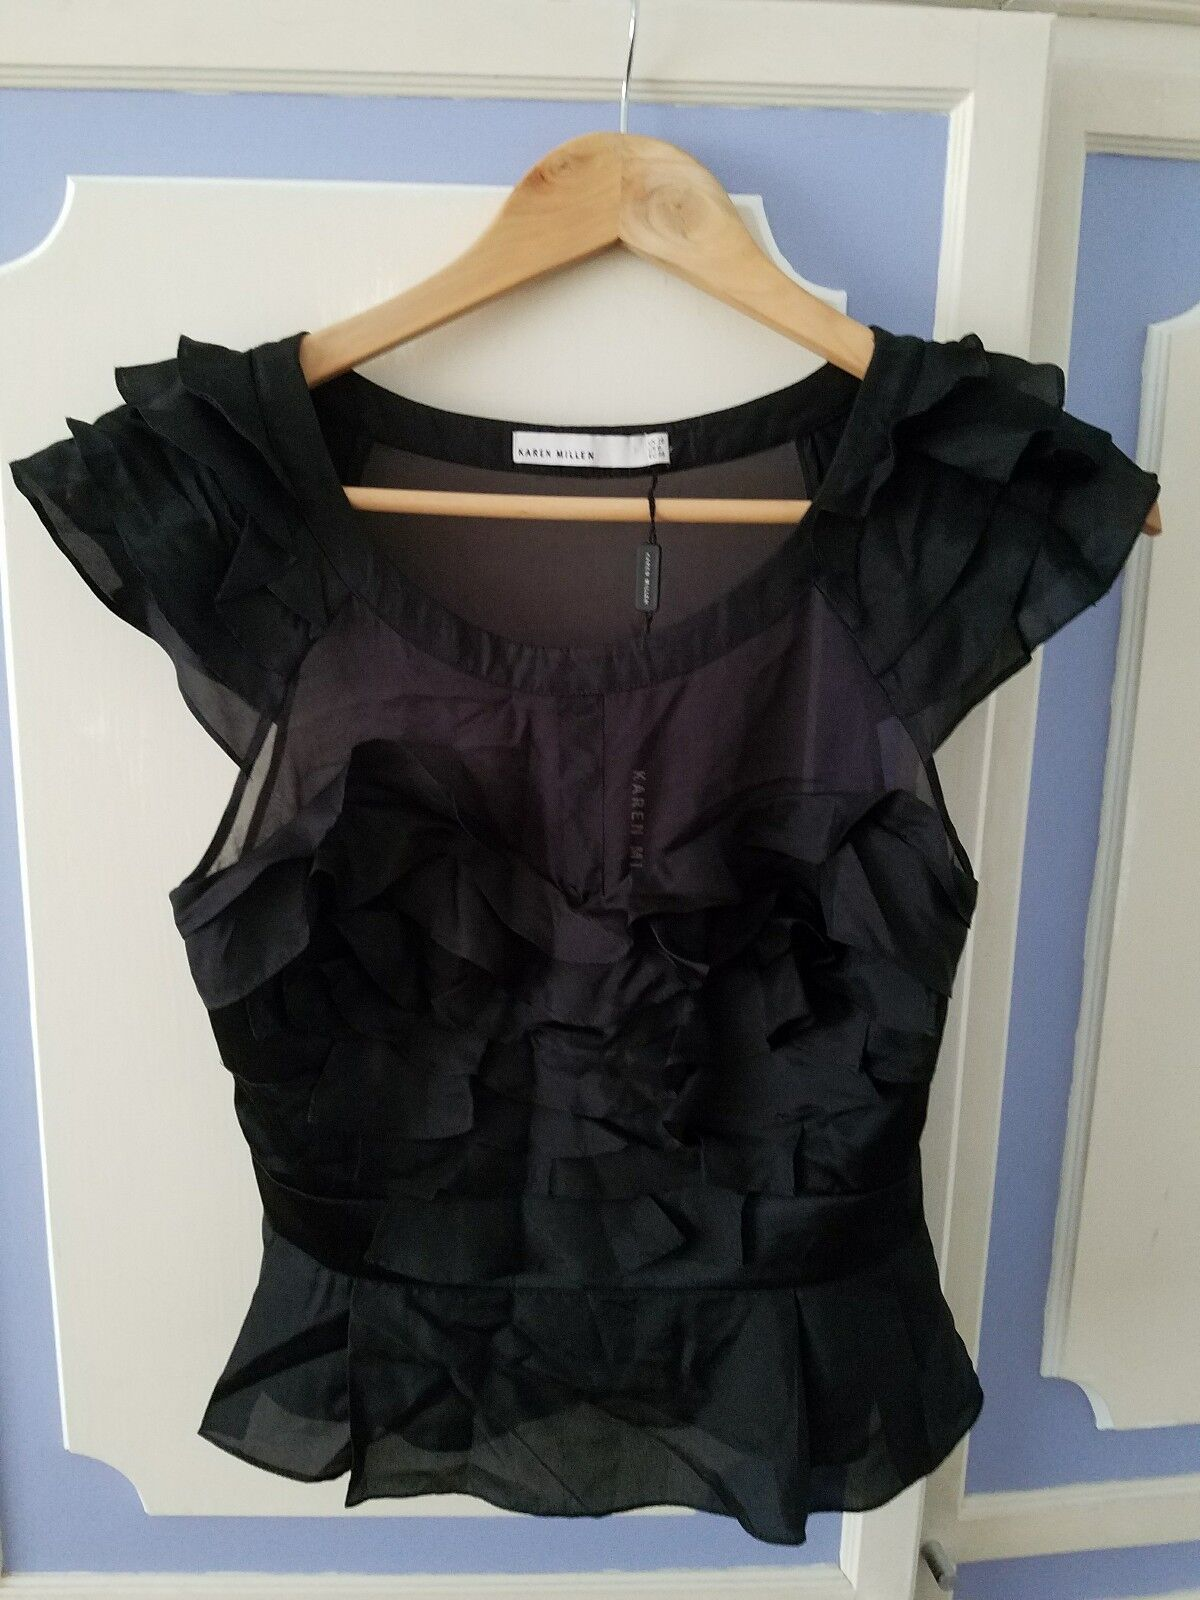 Stunning Karen Milen 100% Silk Top, Größe UK10 - brand new with tags, RRP